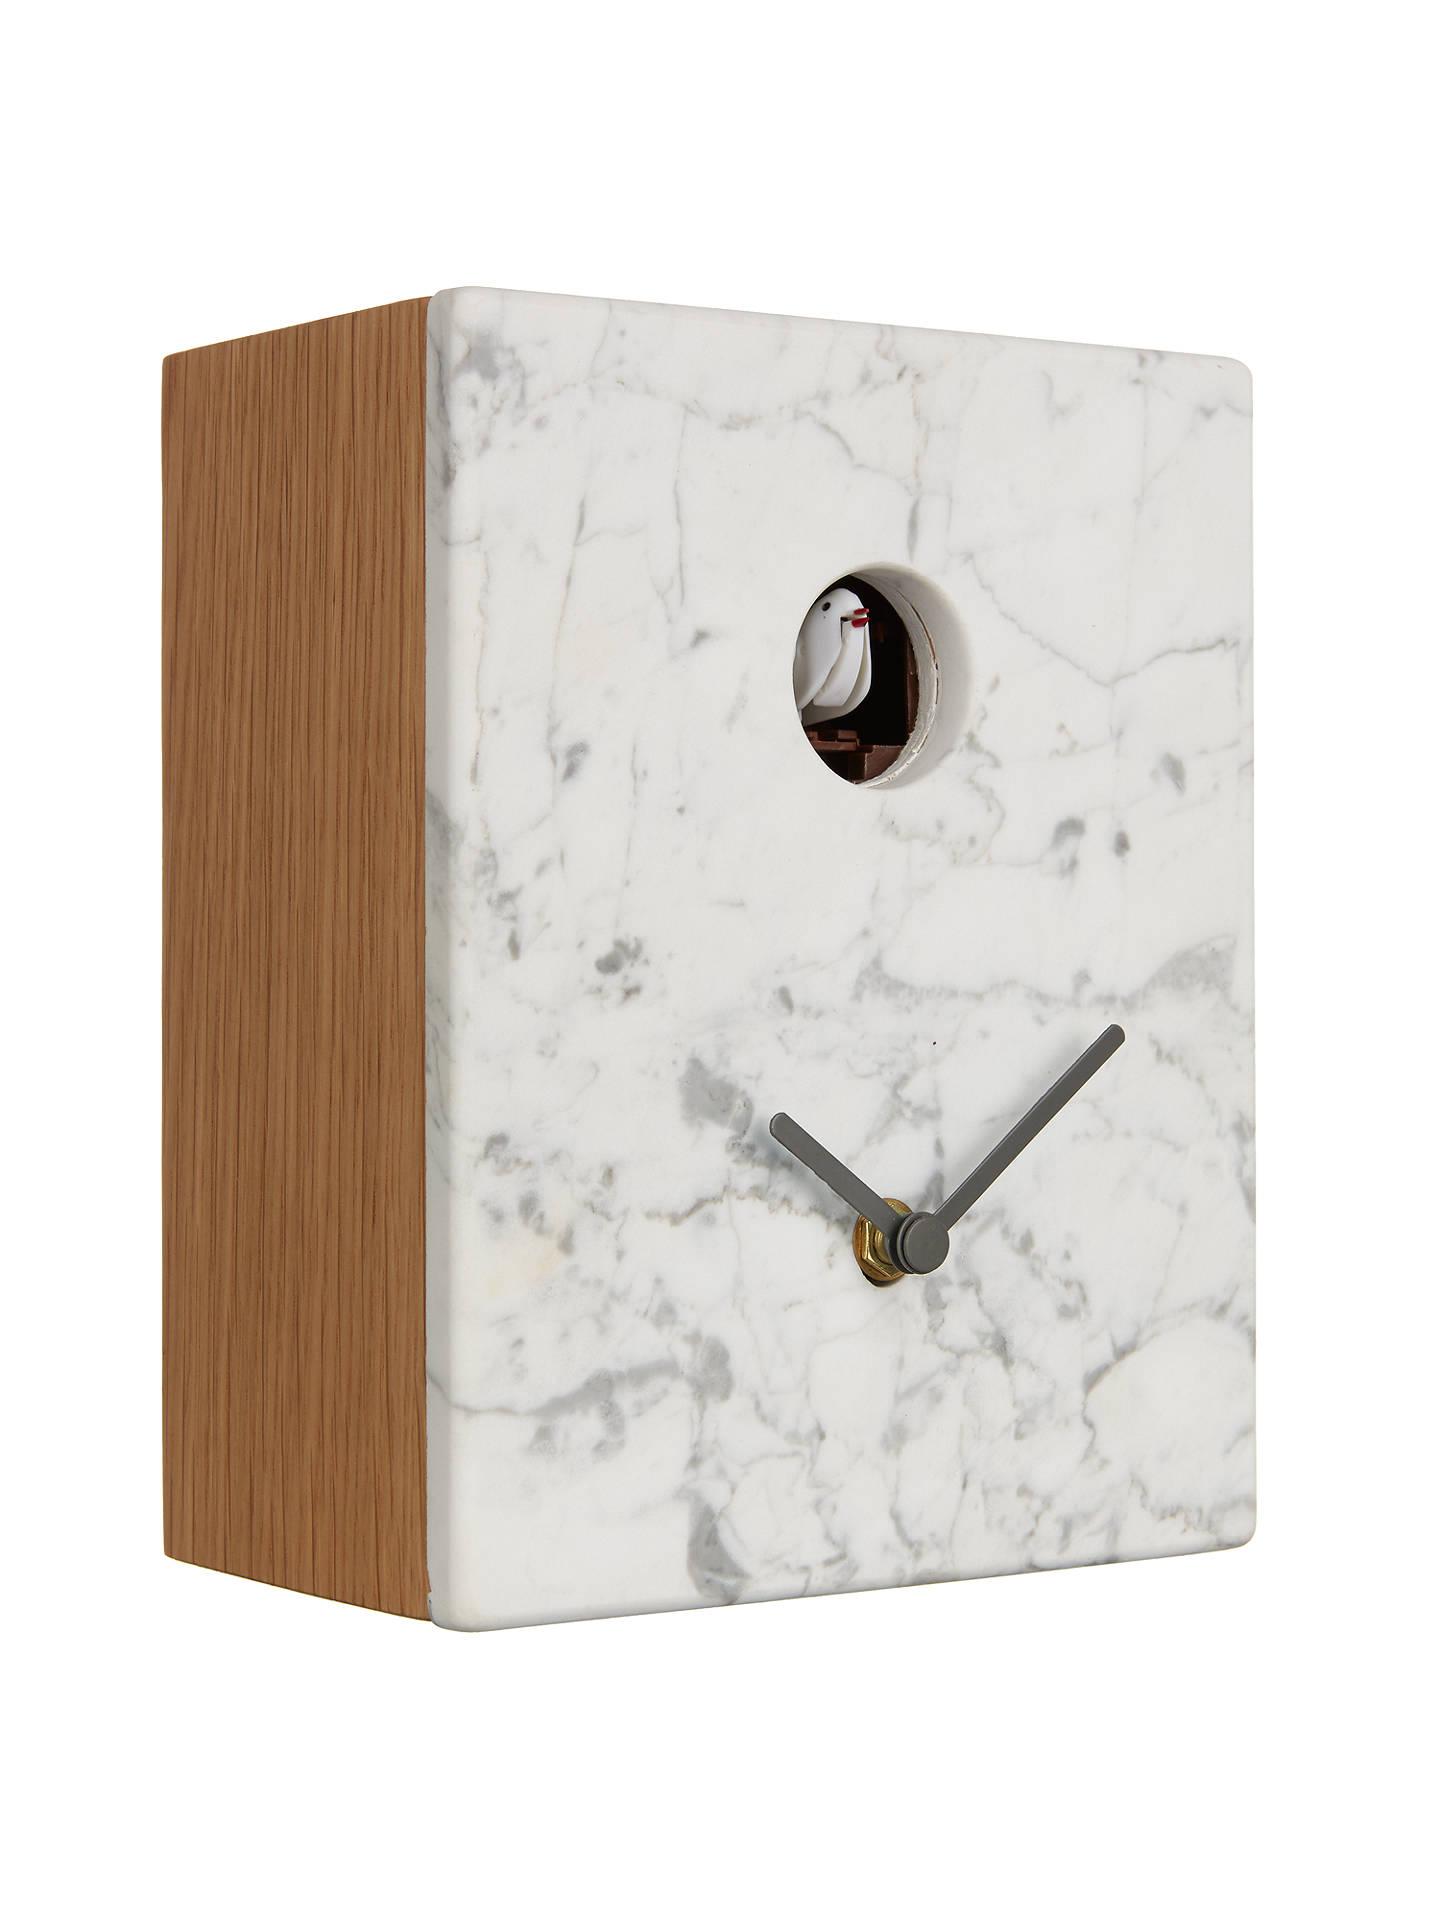 Diamantini Domeniconi Portobello Marble Cuckoo Clock 21 X 16cm Online At Johnlewis